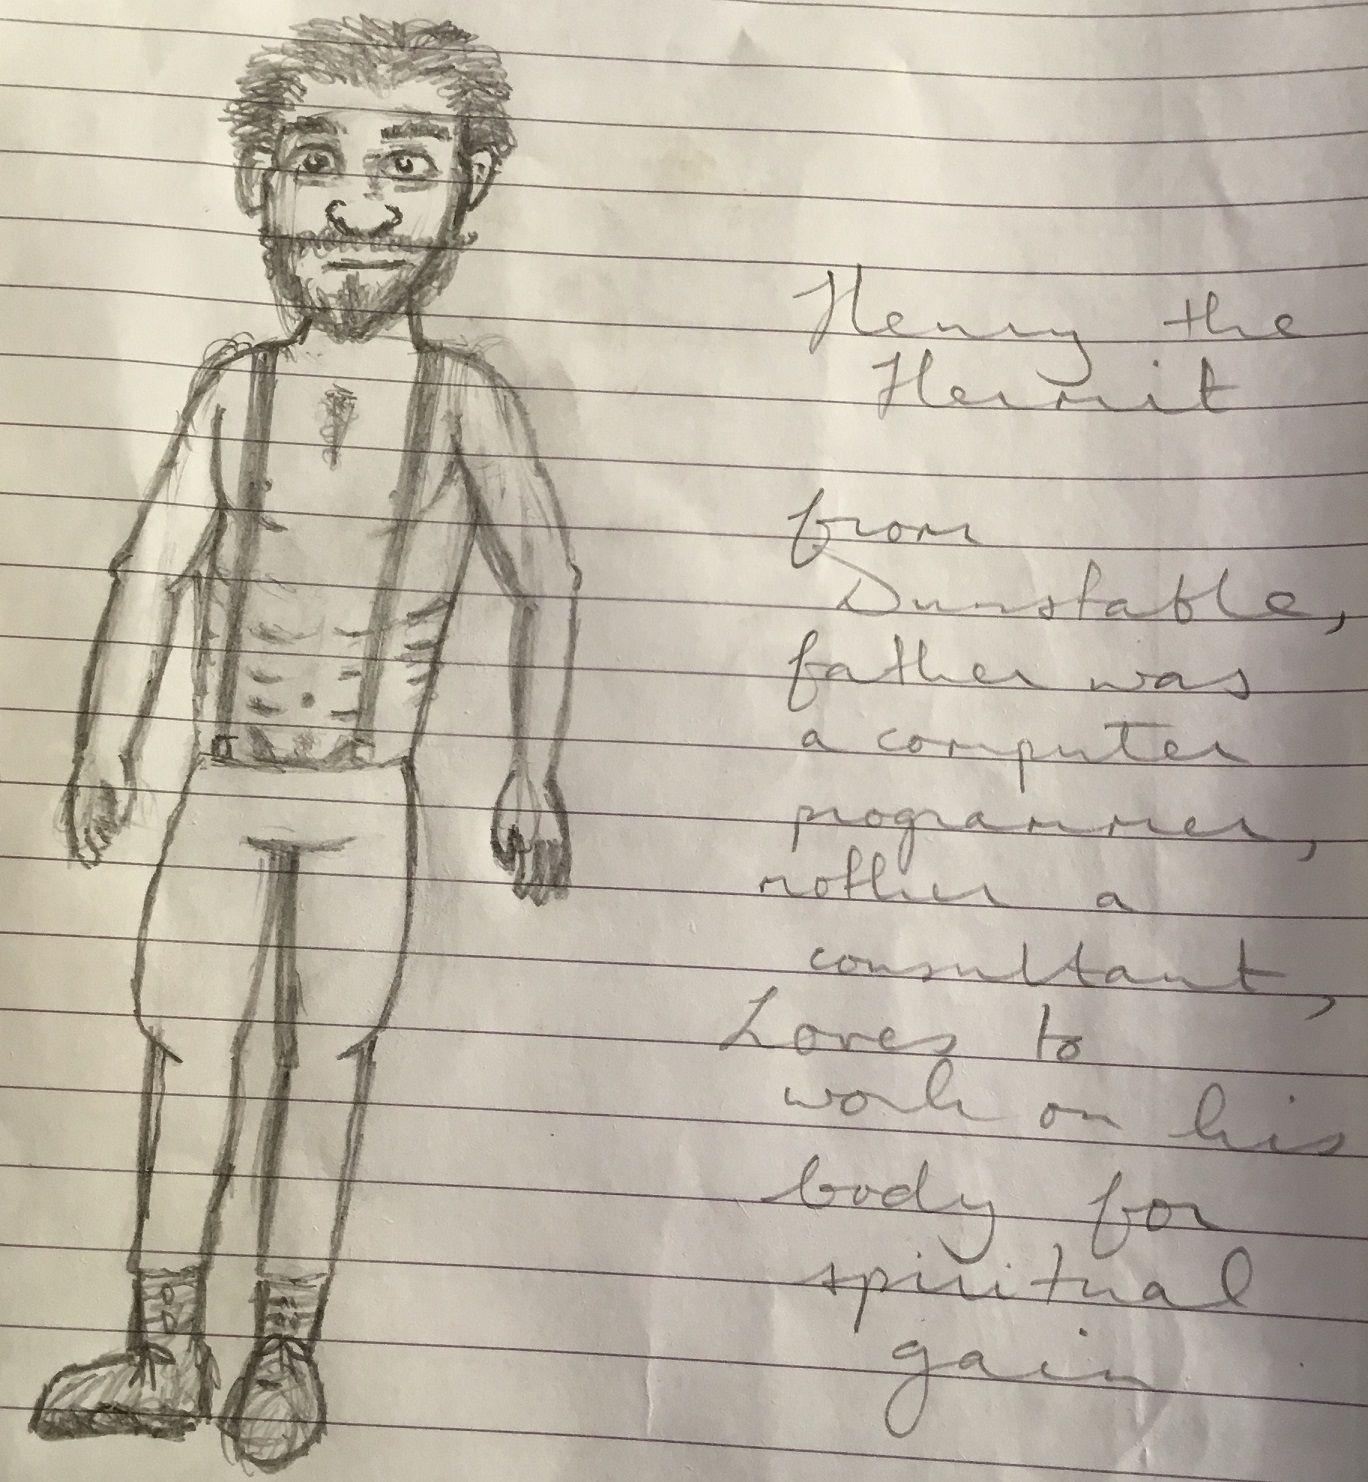 Image may contain: Handwriting, Sketch, Drawing, Person, Human, Art, Text